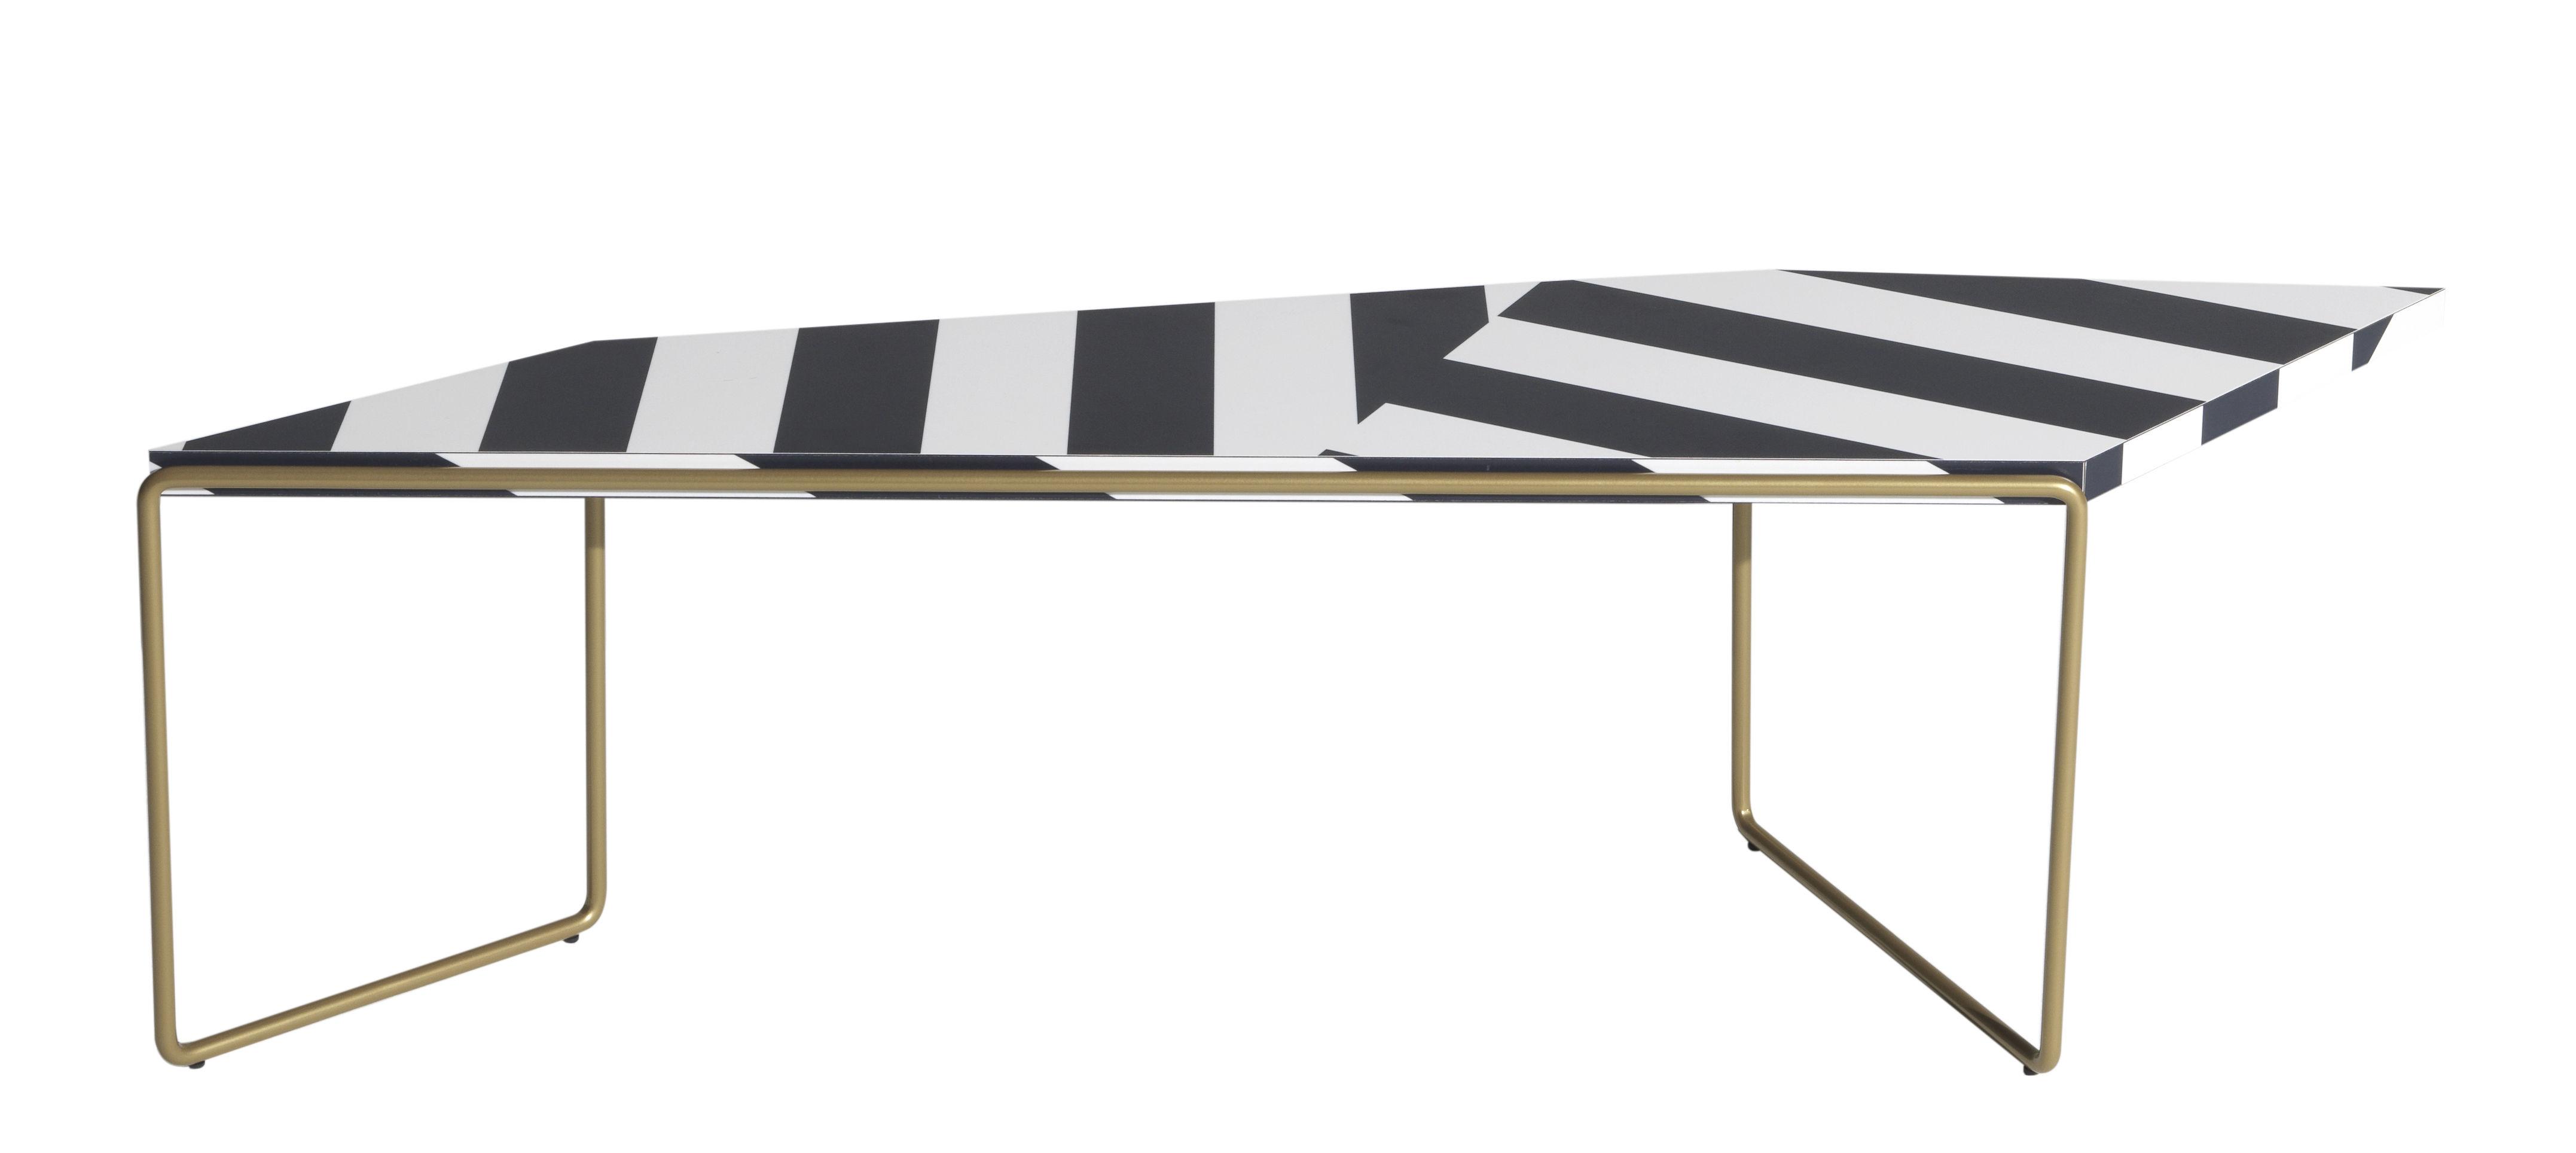 Furniture - Coffee Tables - Zagazig Coffee table - / 119 x 36 cm x H 38 cm by Driade - Black stripes - HPL, Steel